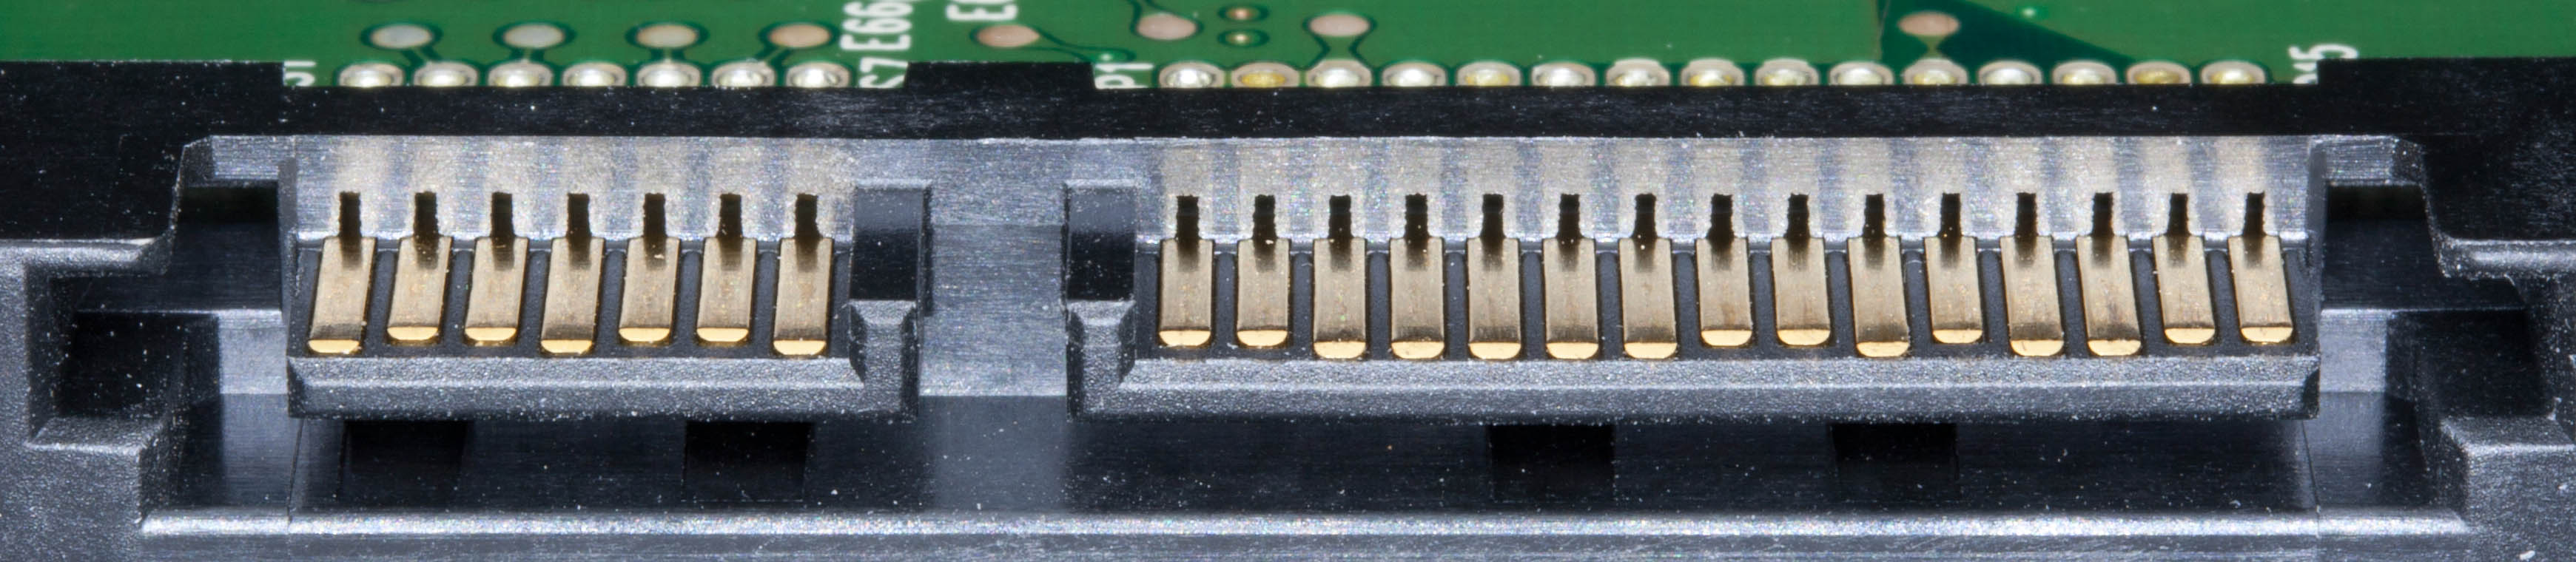 7 pins, a gap, then 15 pins